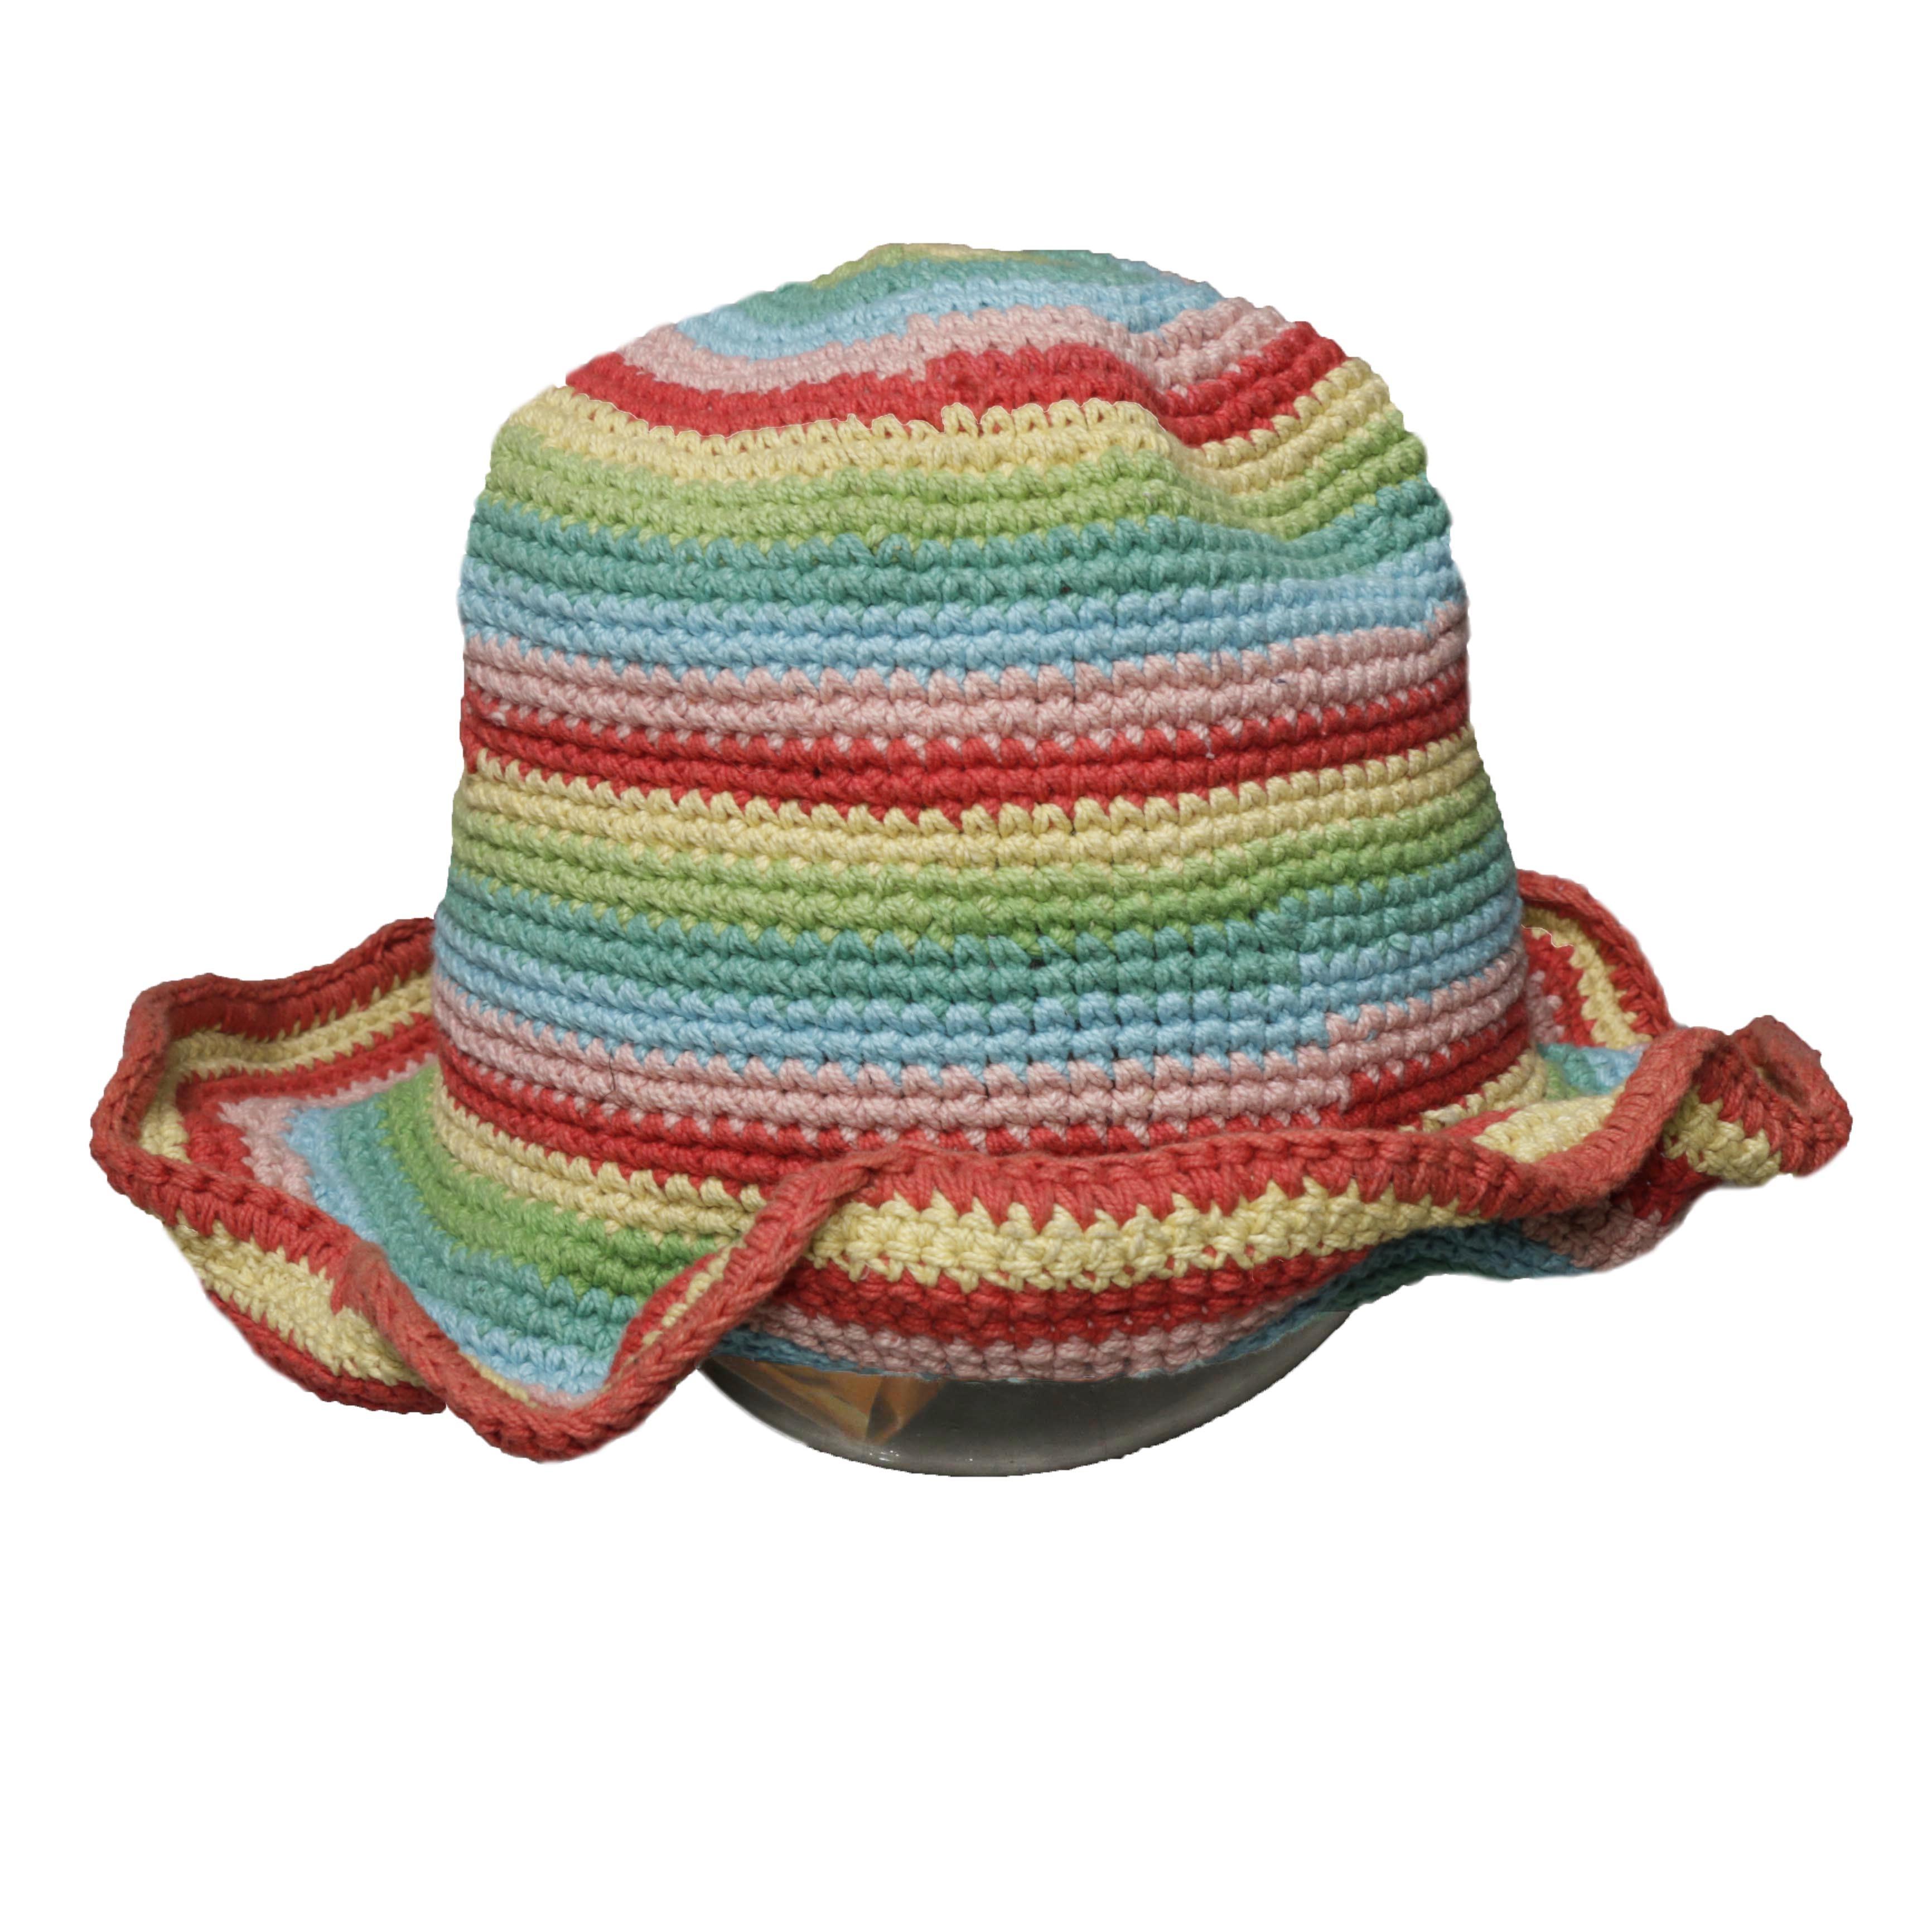 MultiBorder Knit TulipHat